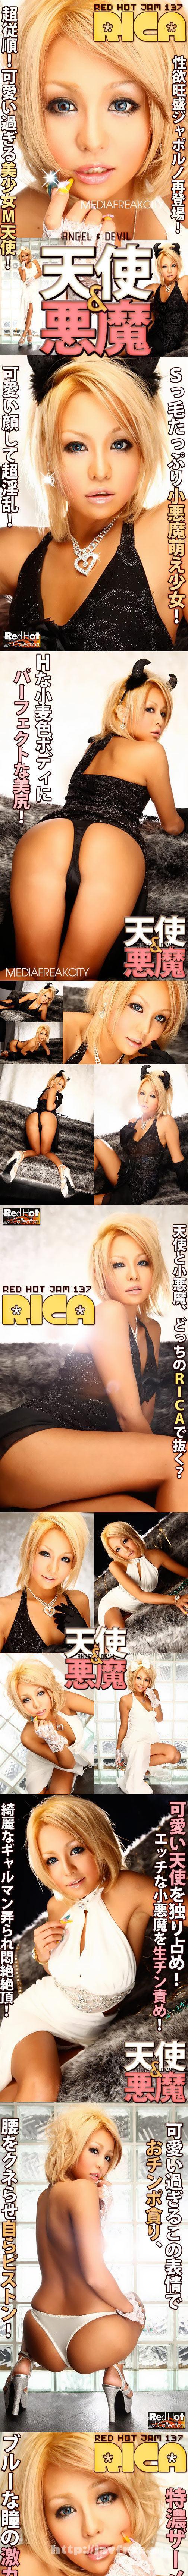 [RHJ-137] レッドホットジャム Vol.137 天使と悪魔 my both side : RICA - image RHJ-137_1 on https://javfree.me